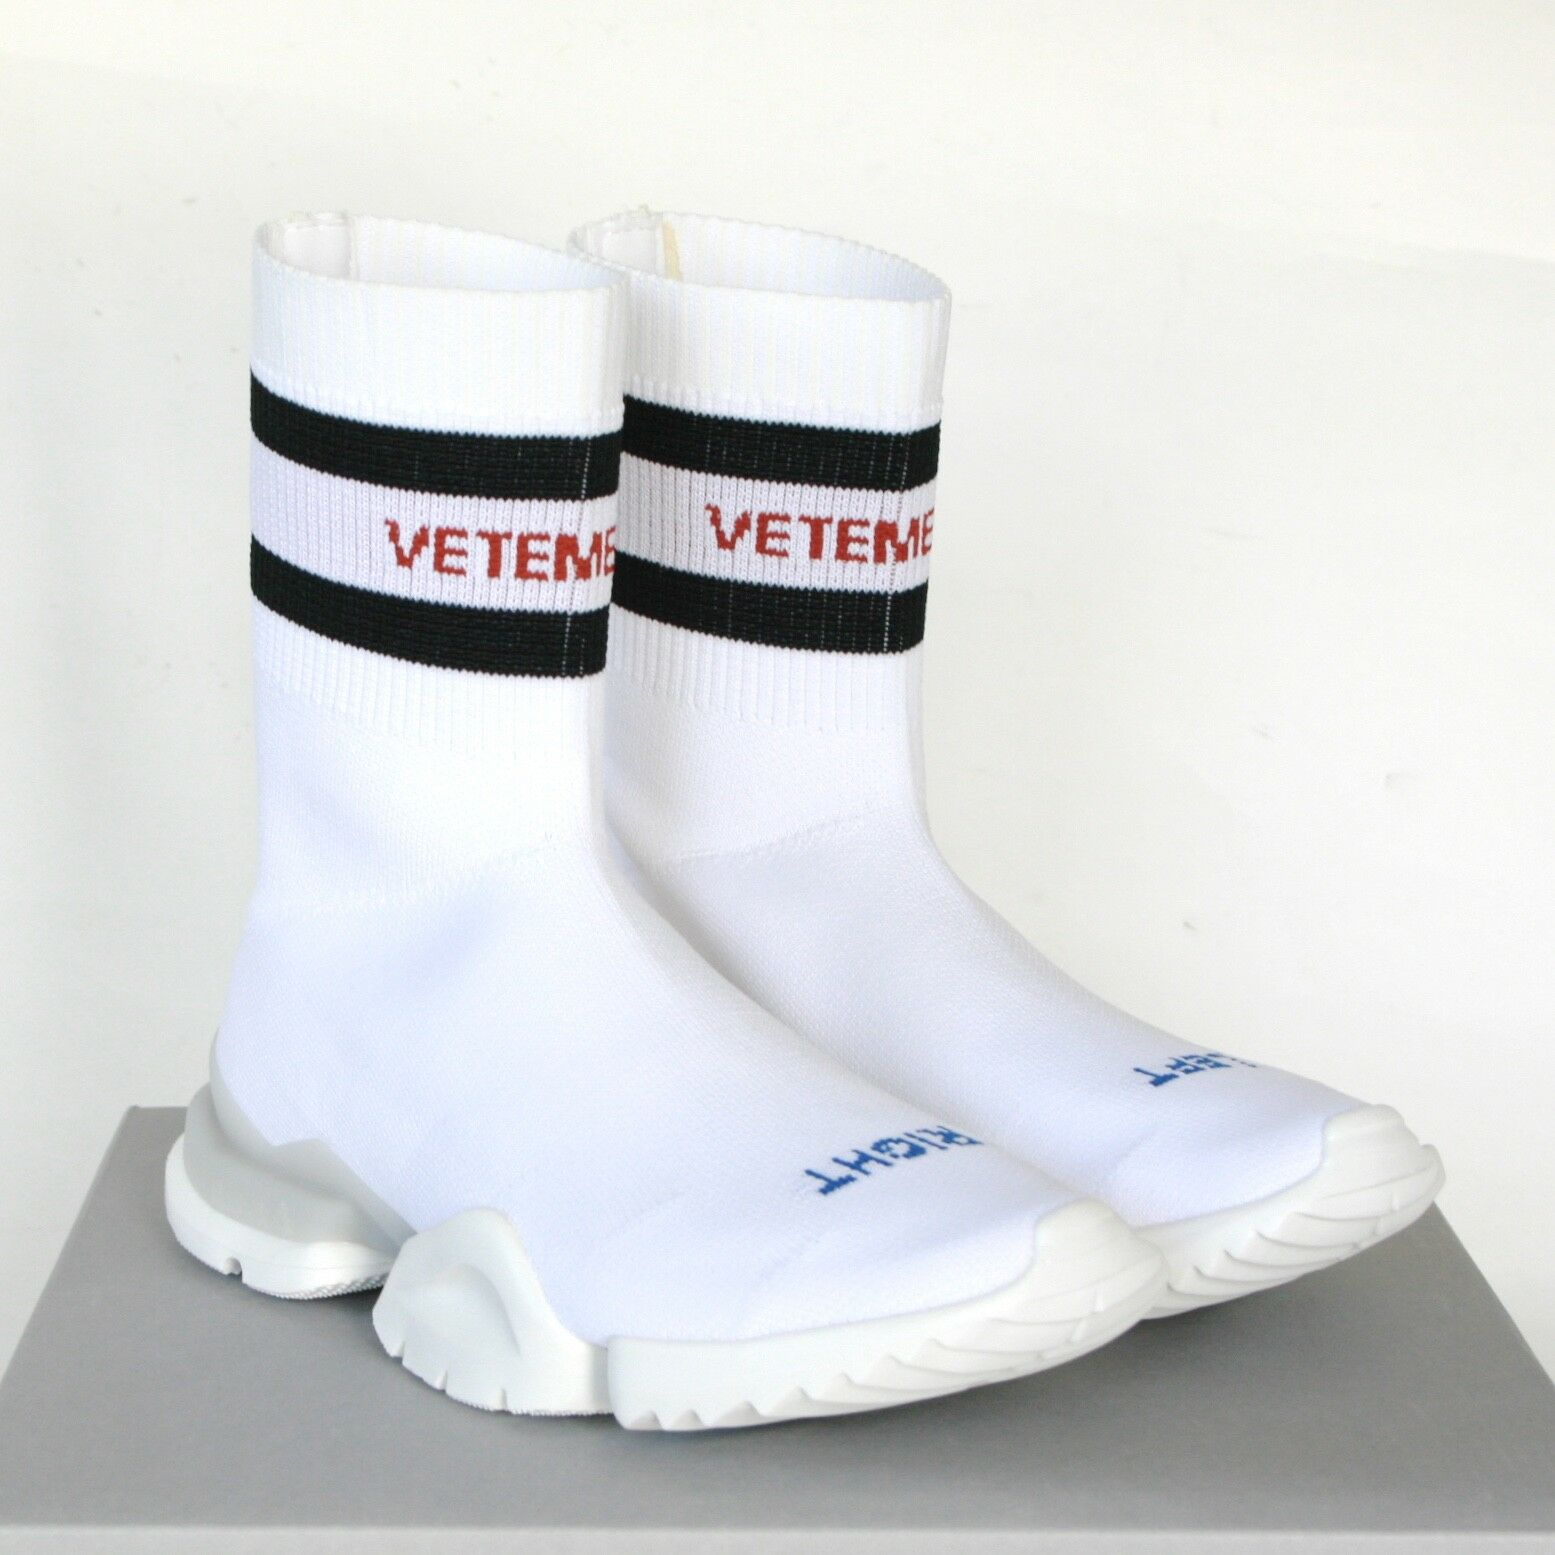 VETEMENTS x REEBOK  840 knit logo avvio avvio avvio sock pump scarpe da ginnastica running scarpe 38.5 NEW 19090c